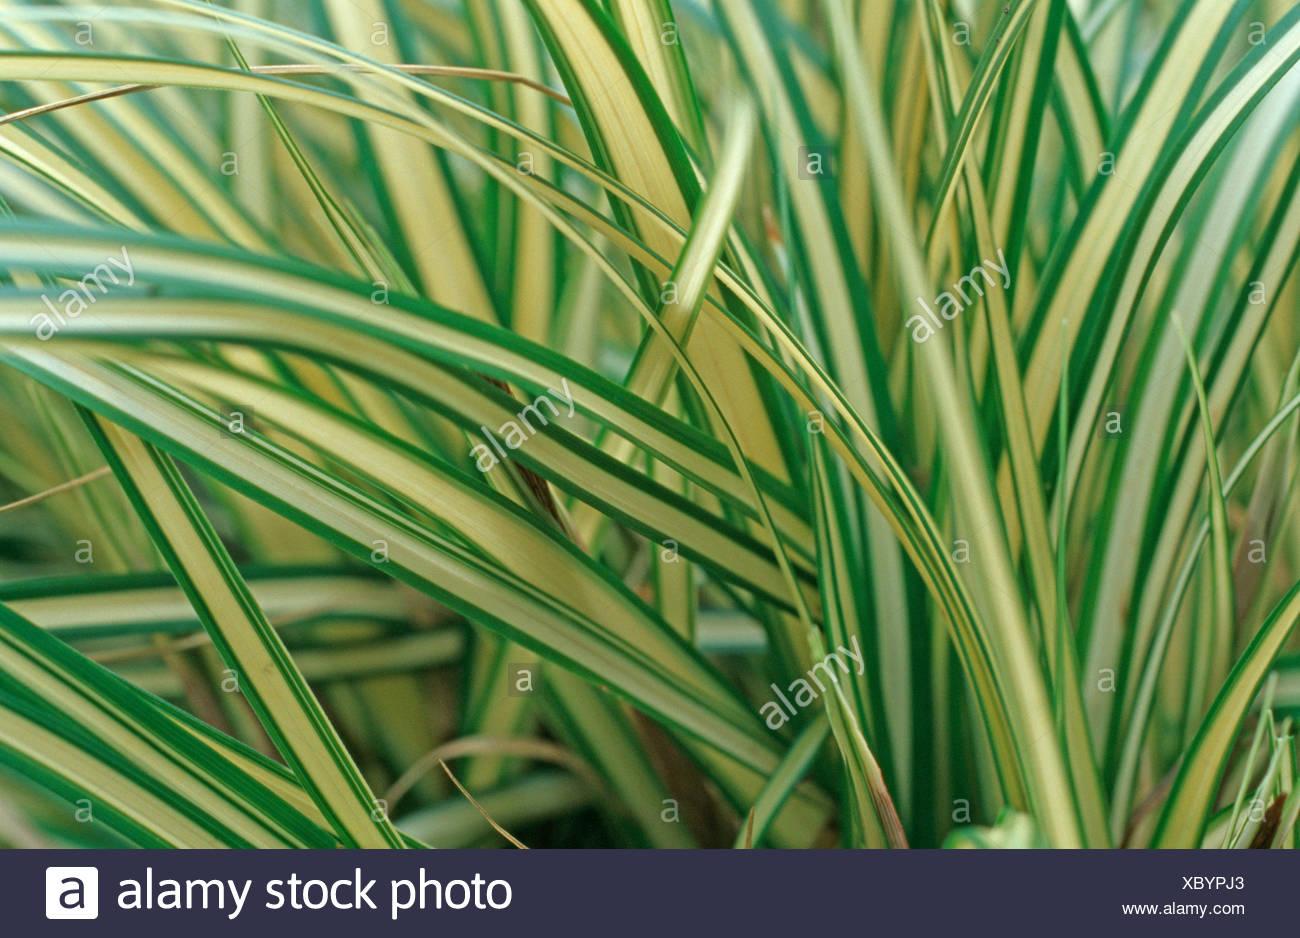 Japanese Sedge (Carex Evergold, Carex hachijoensis 'Evergold', Carex oshimensis 'Evergold'), leaves - Stock Image